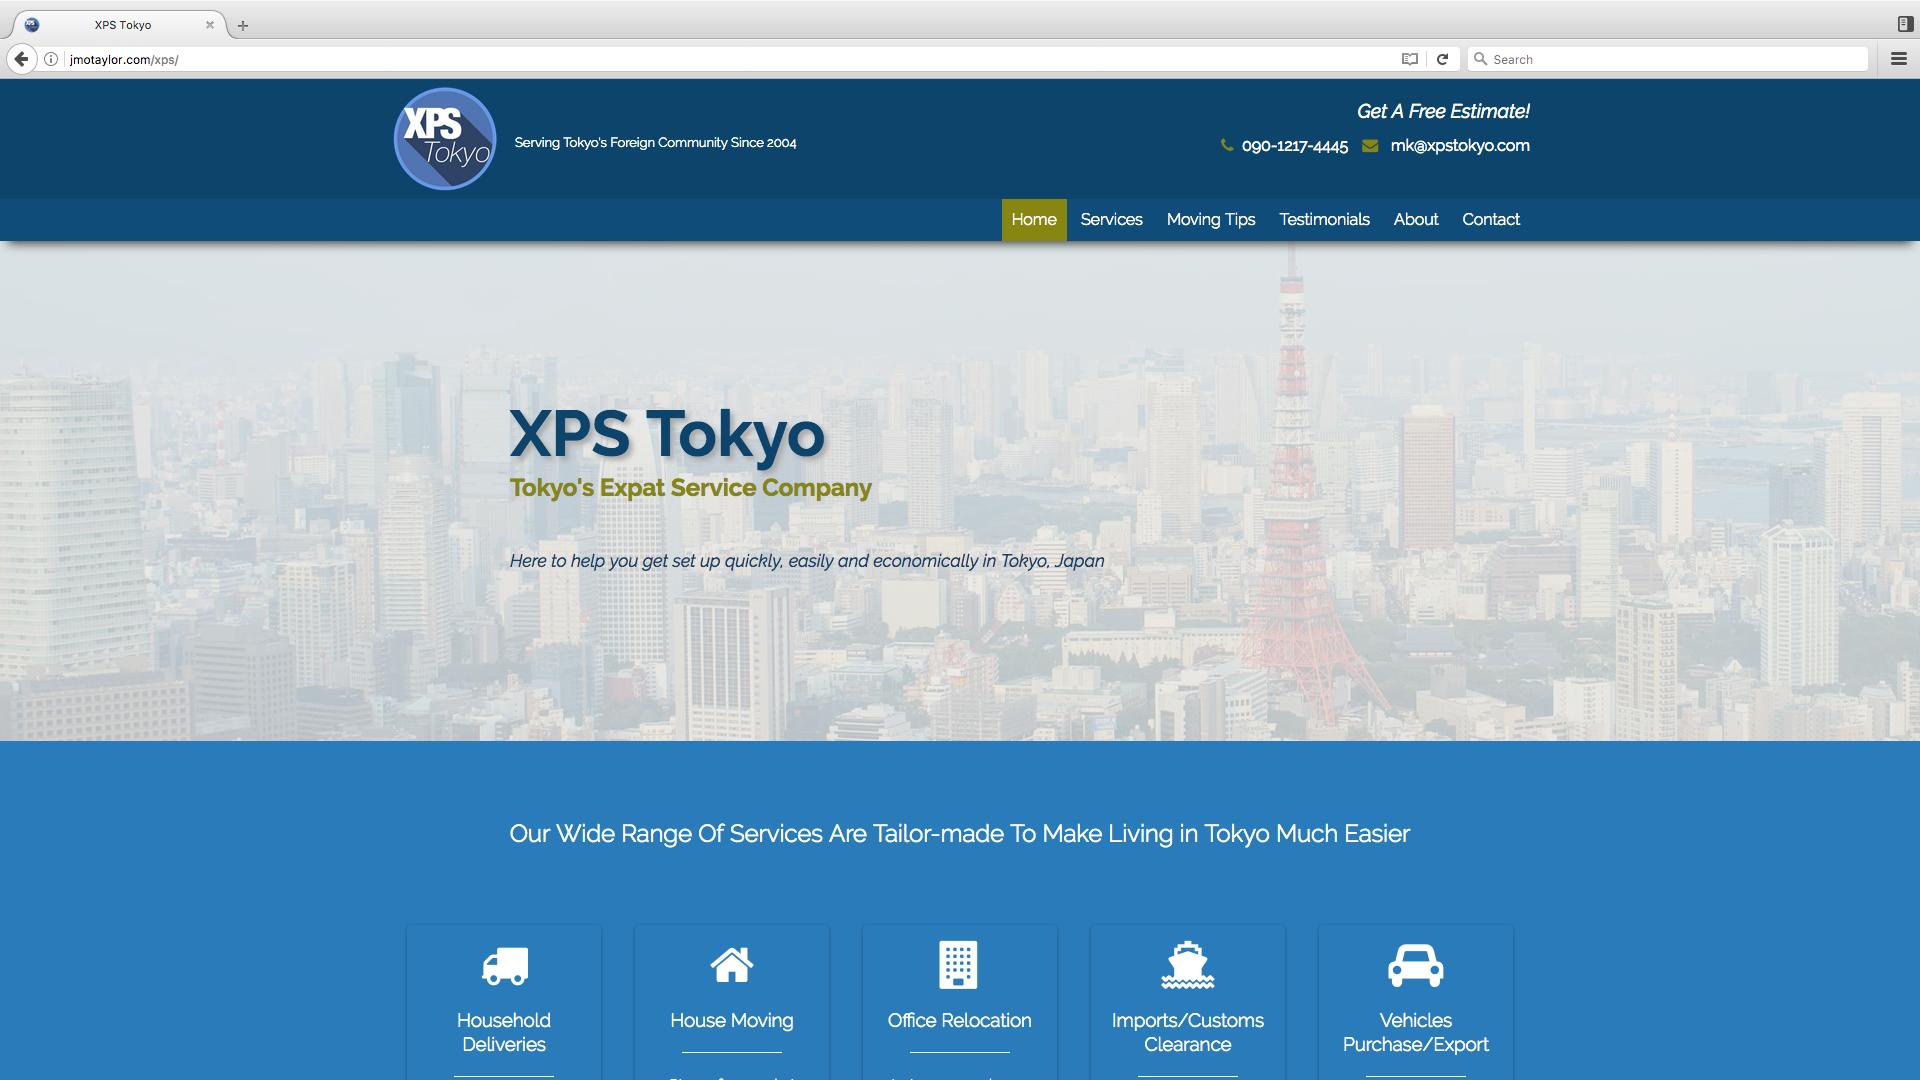 XPS Tokyo website picture